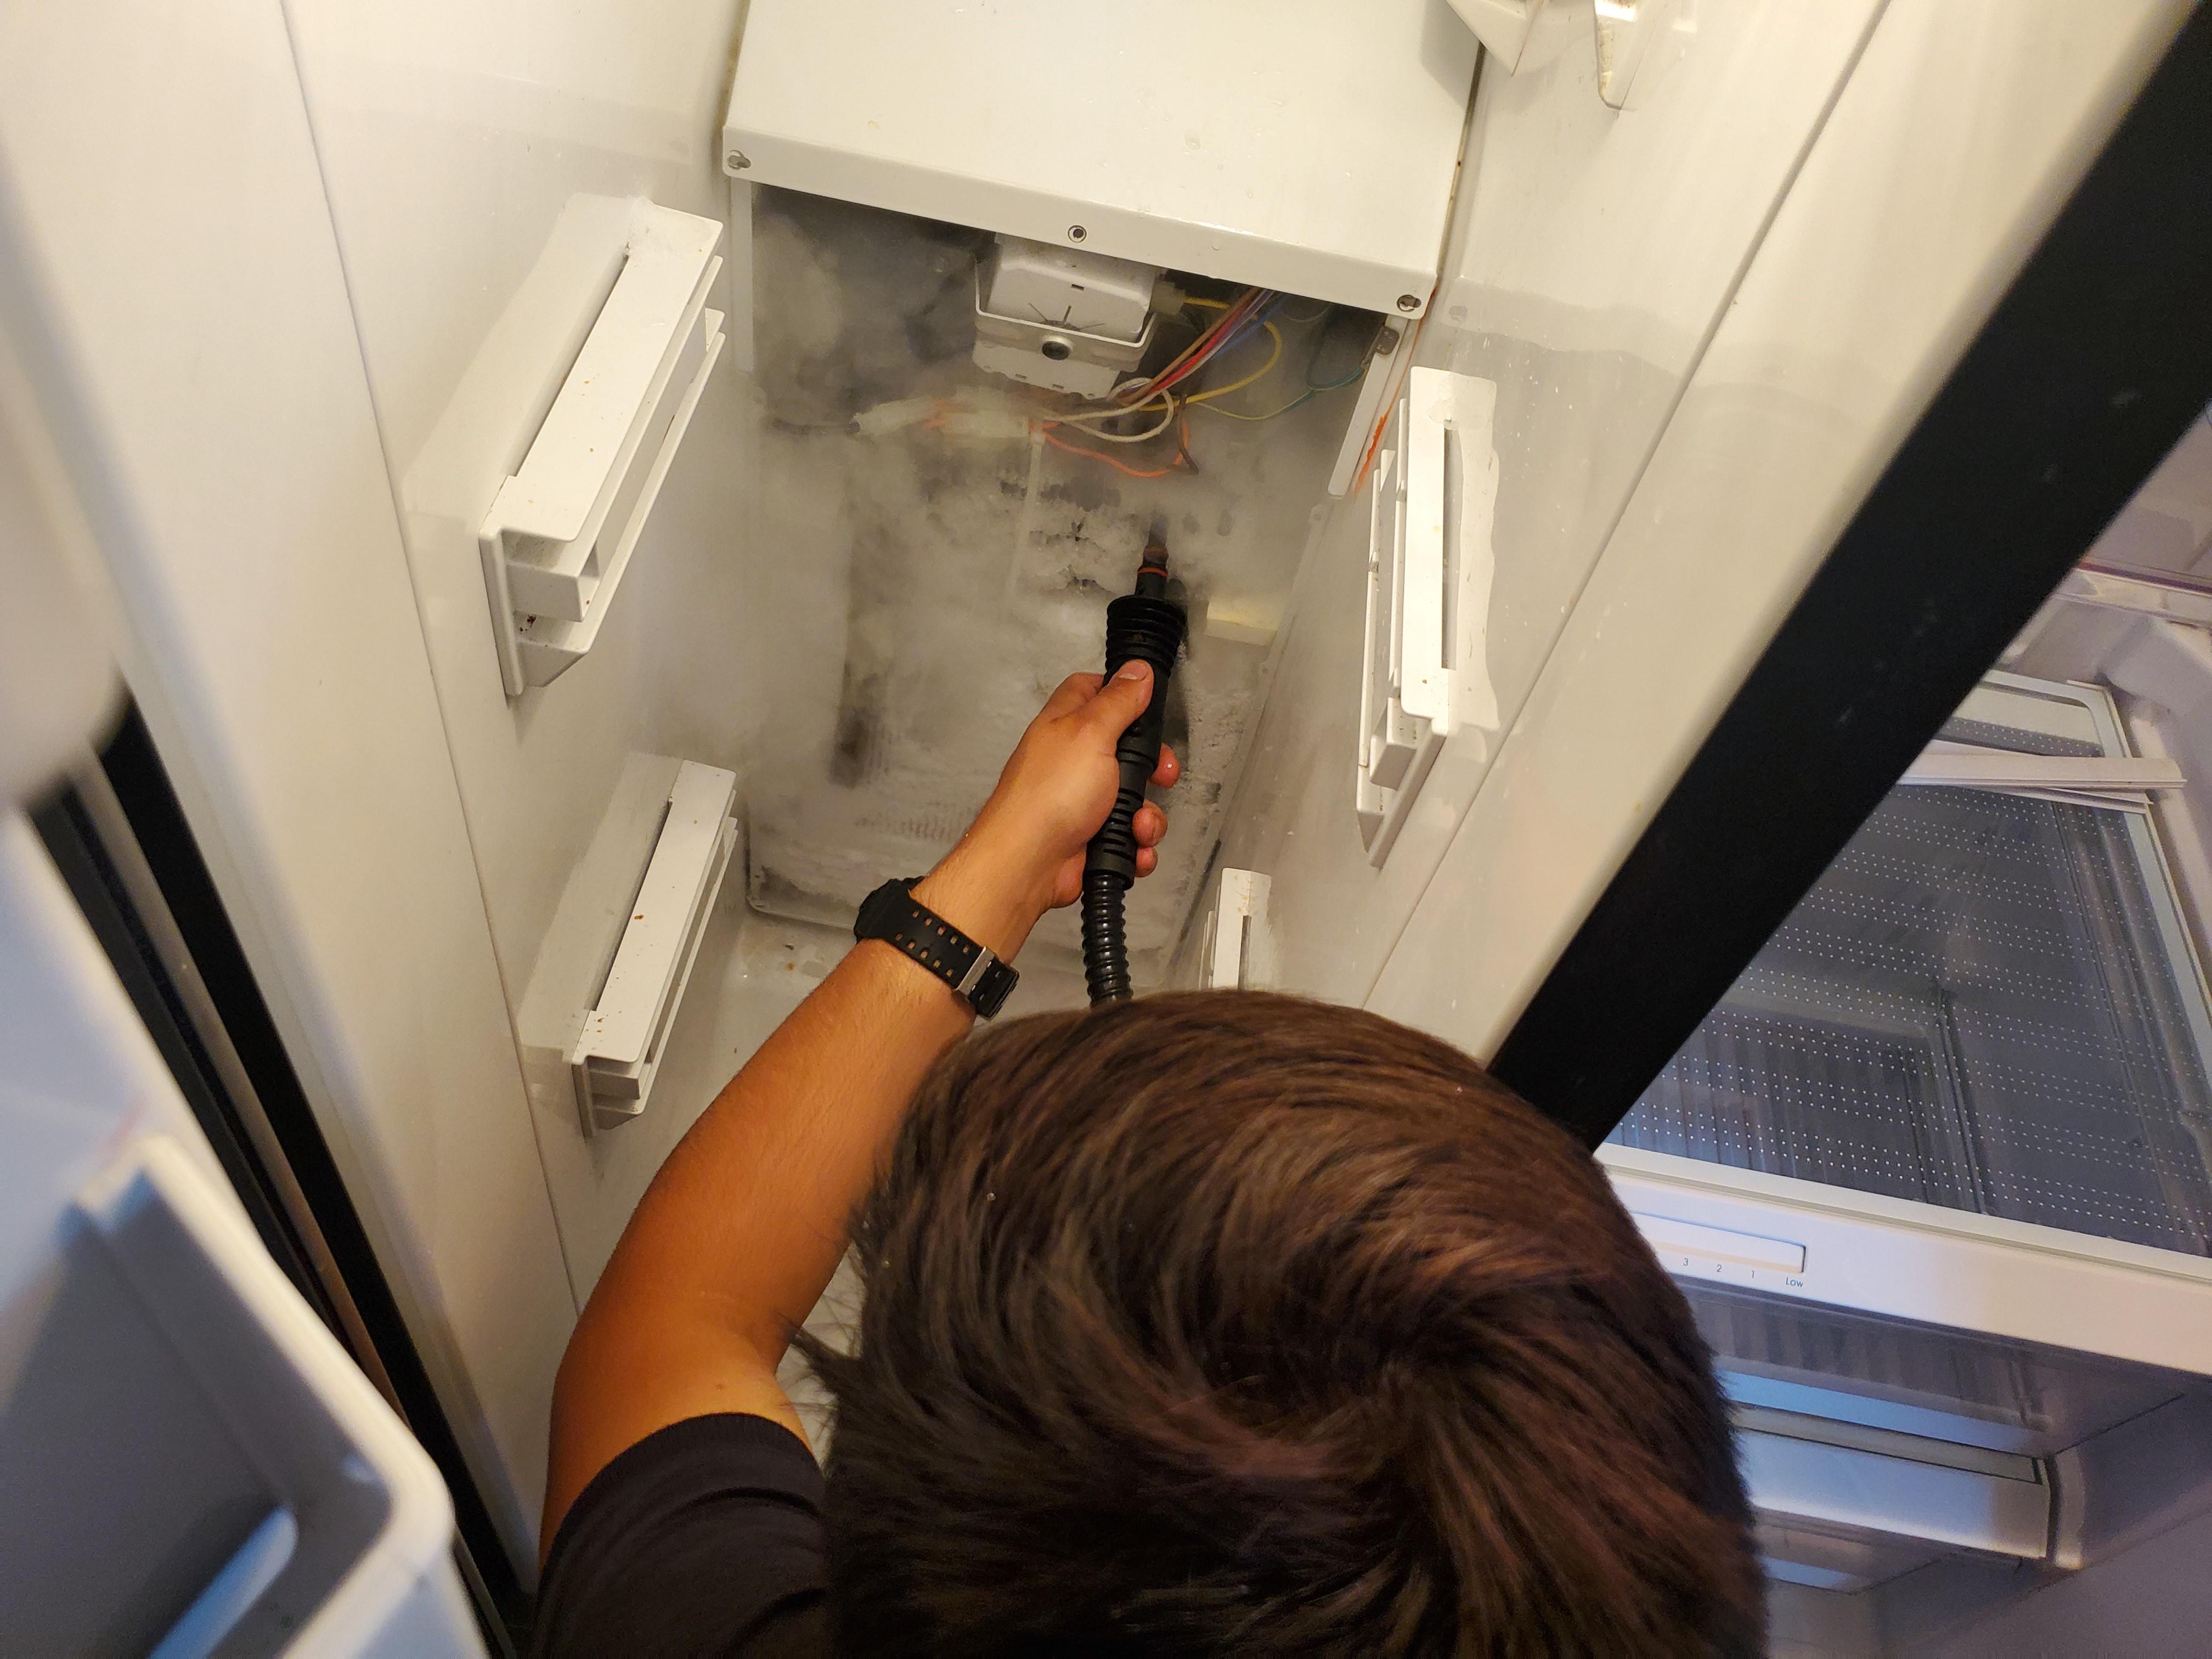 Kitchen Appliance Refrigerator Amp Dishwasher Repairs New